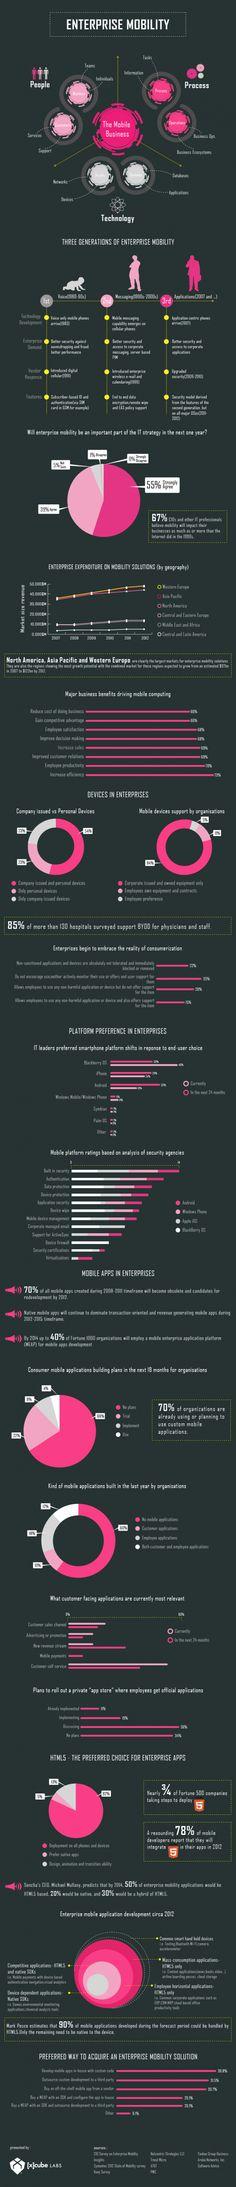 Enterprise Mobility #infographic